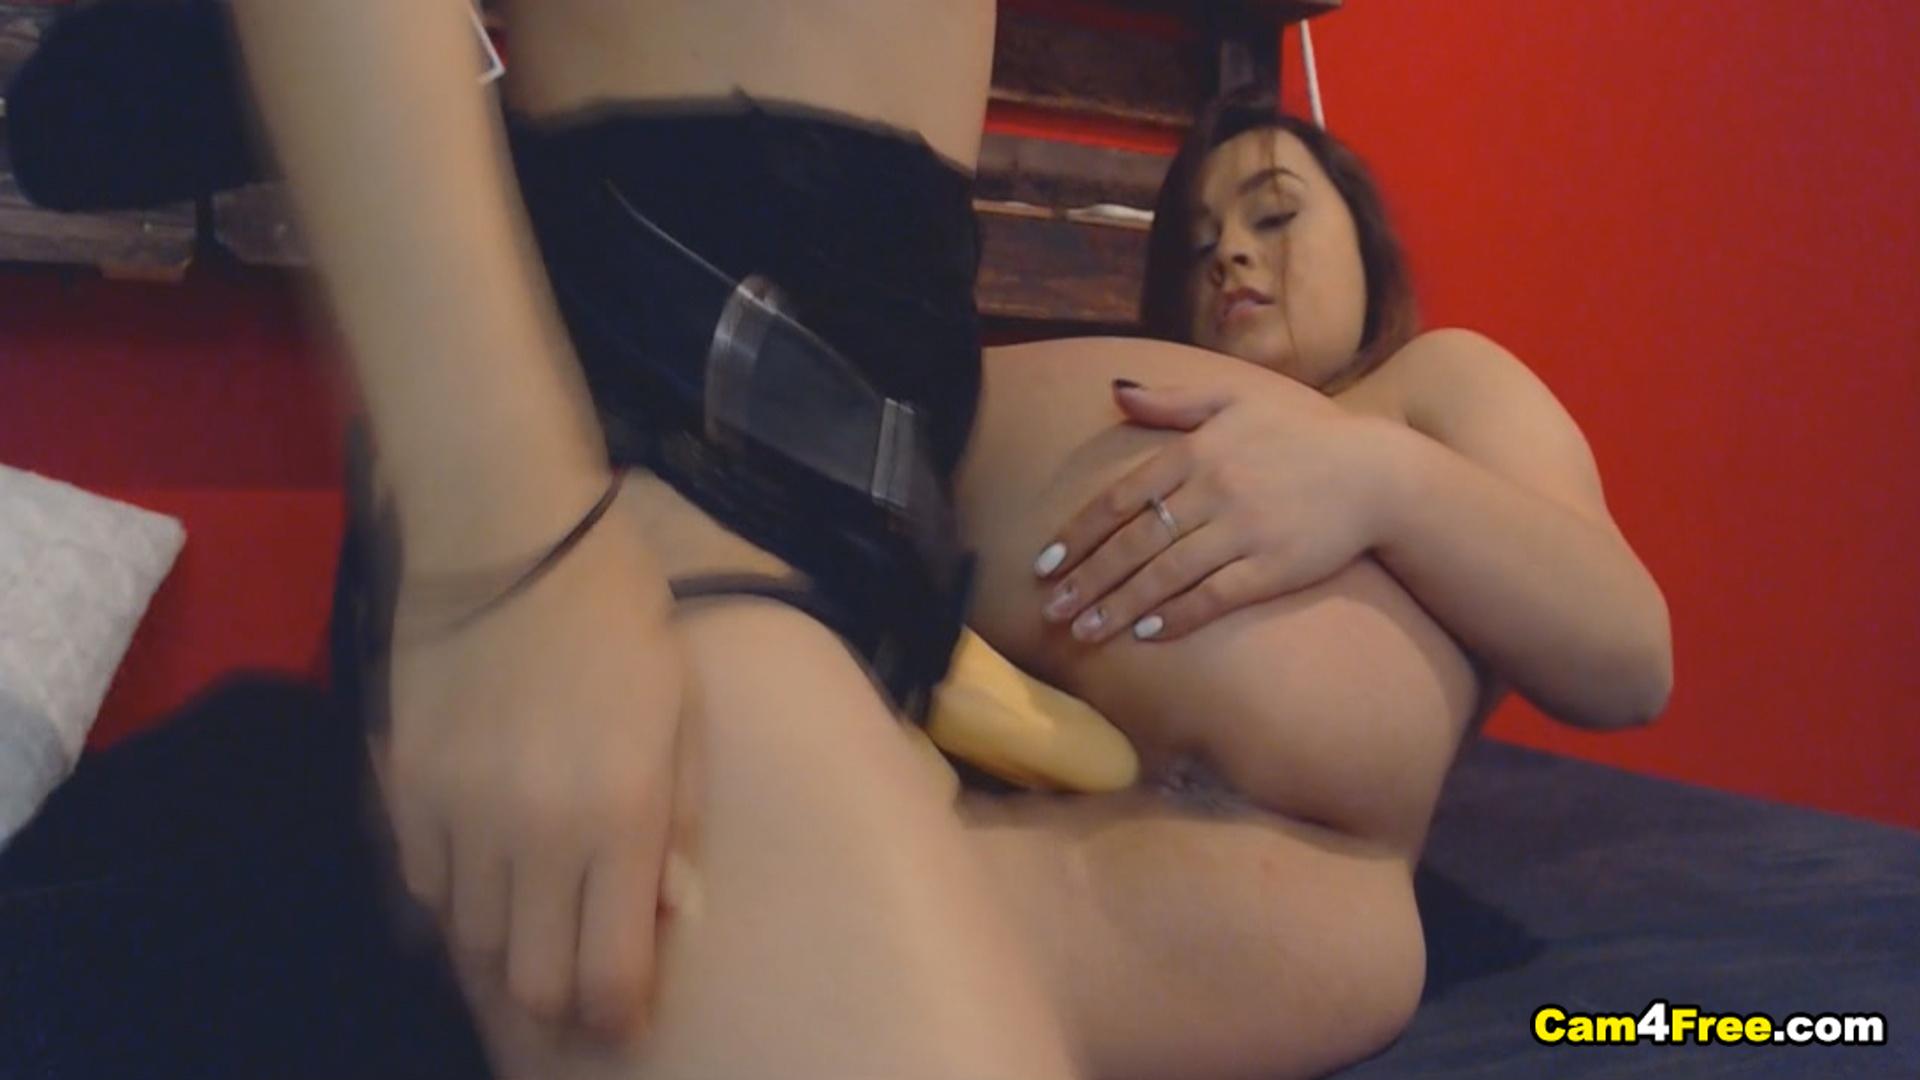 Lesbios sexs porno Petite